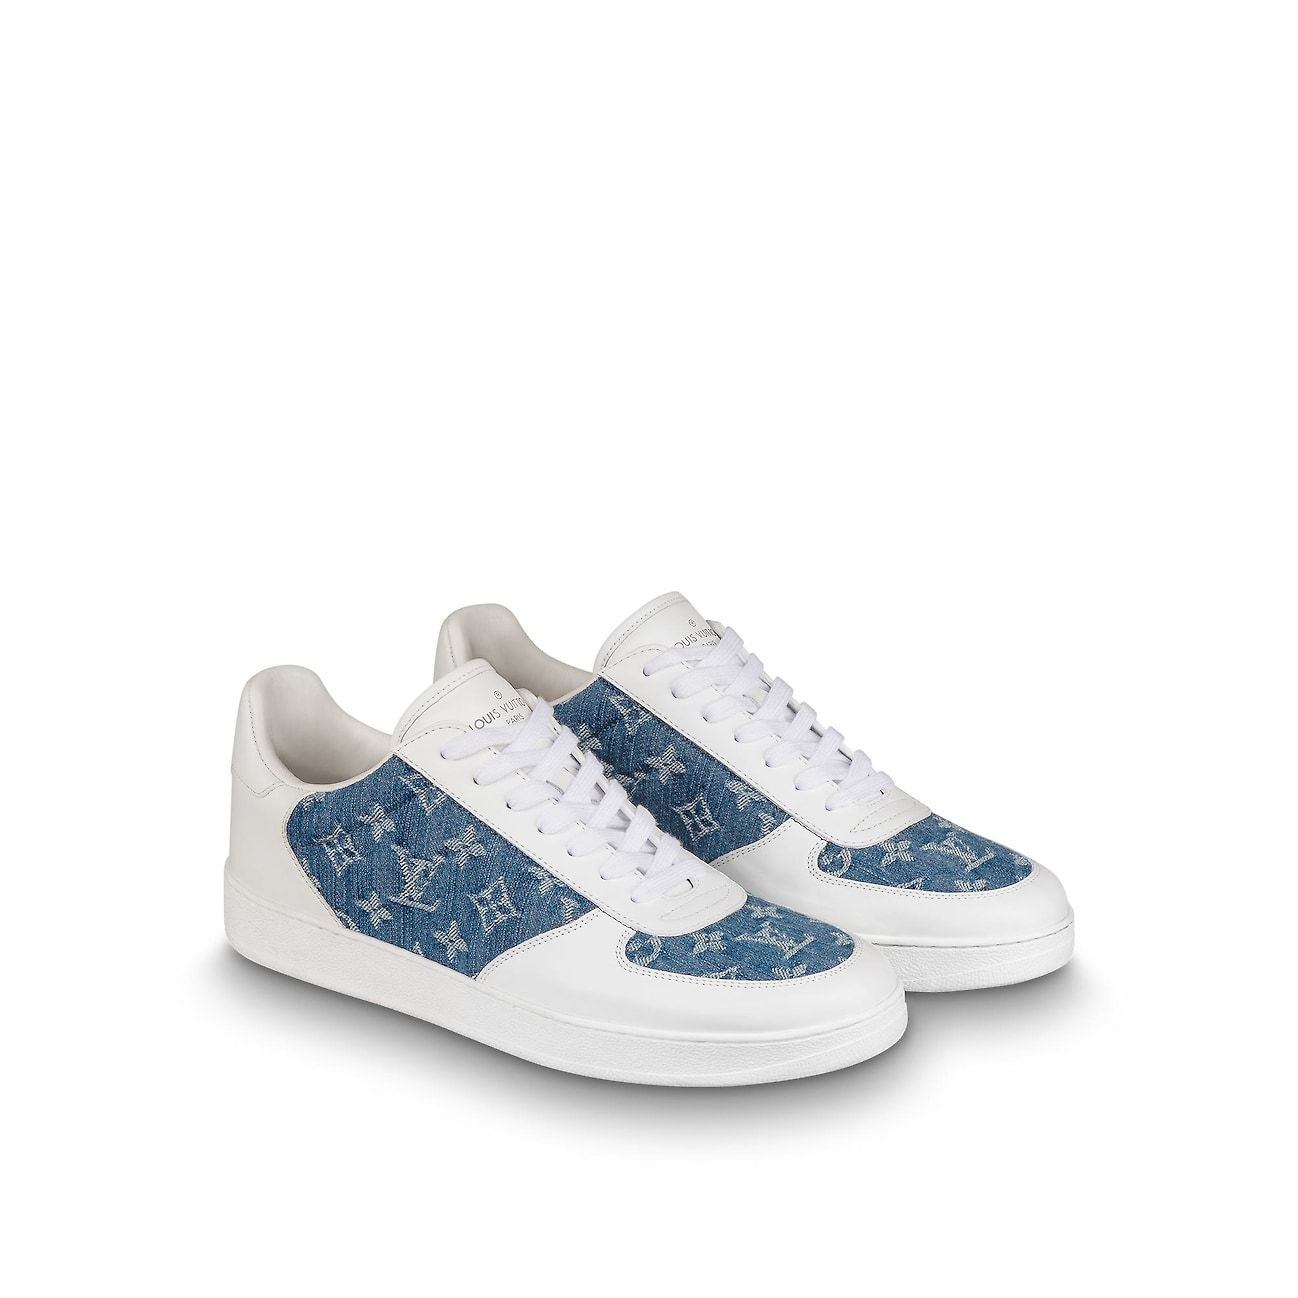 Rivoli Trainer Men Shoes Trainers